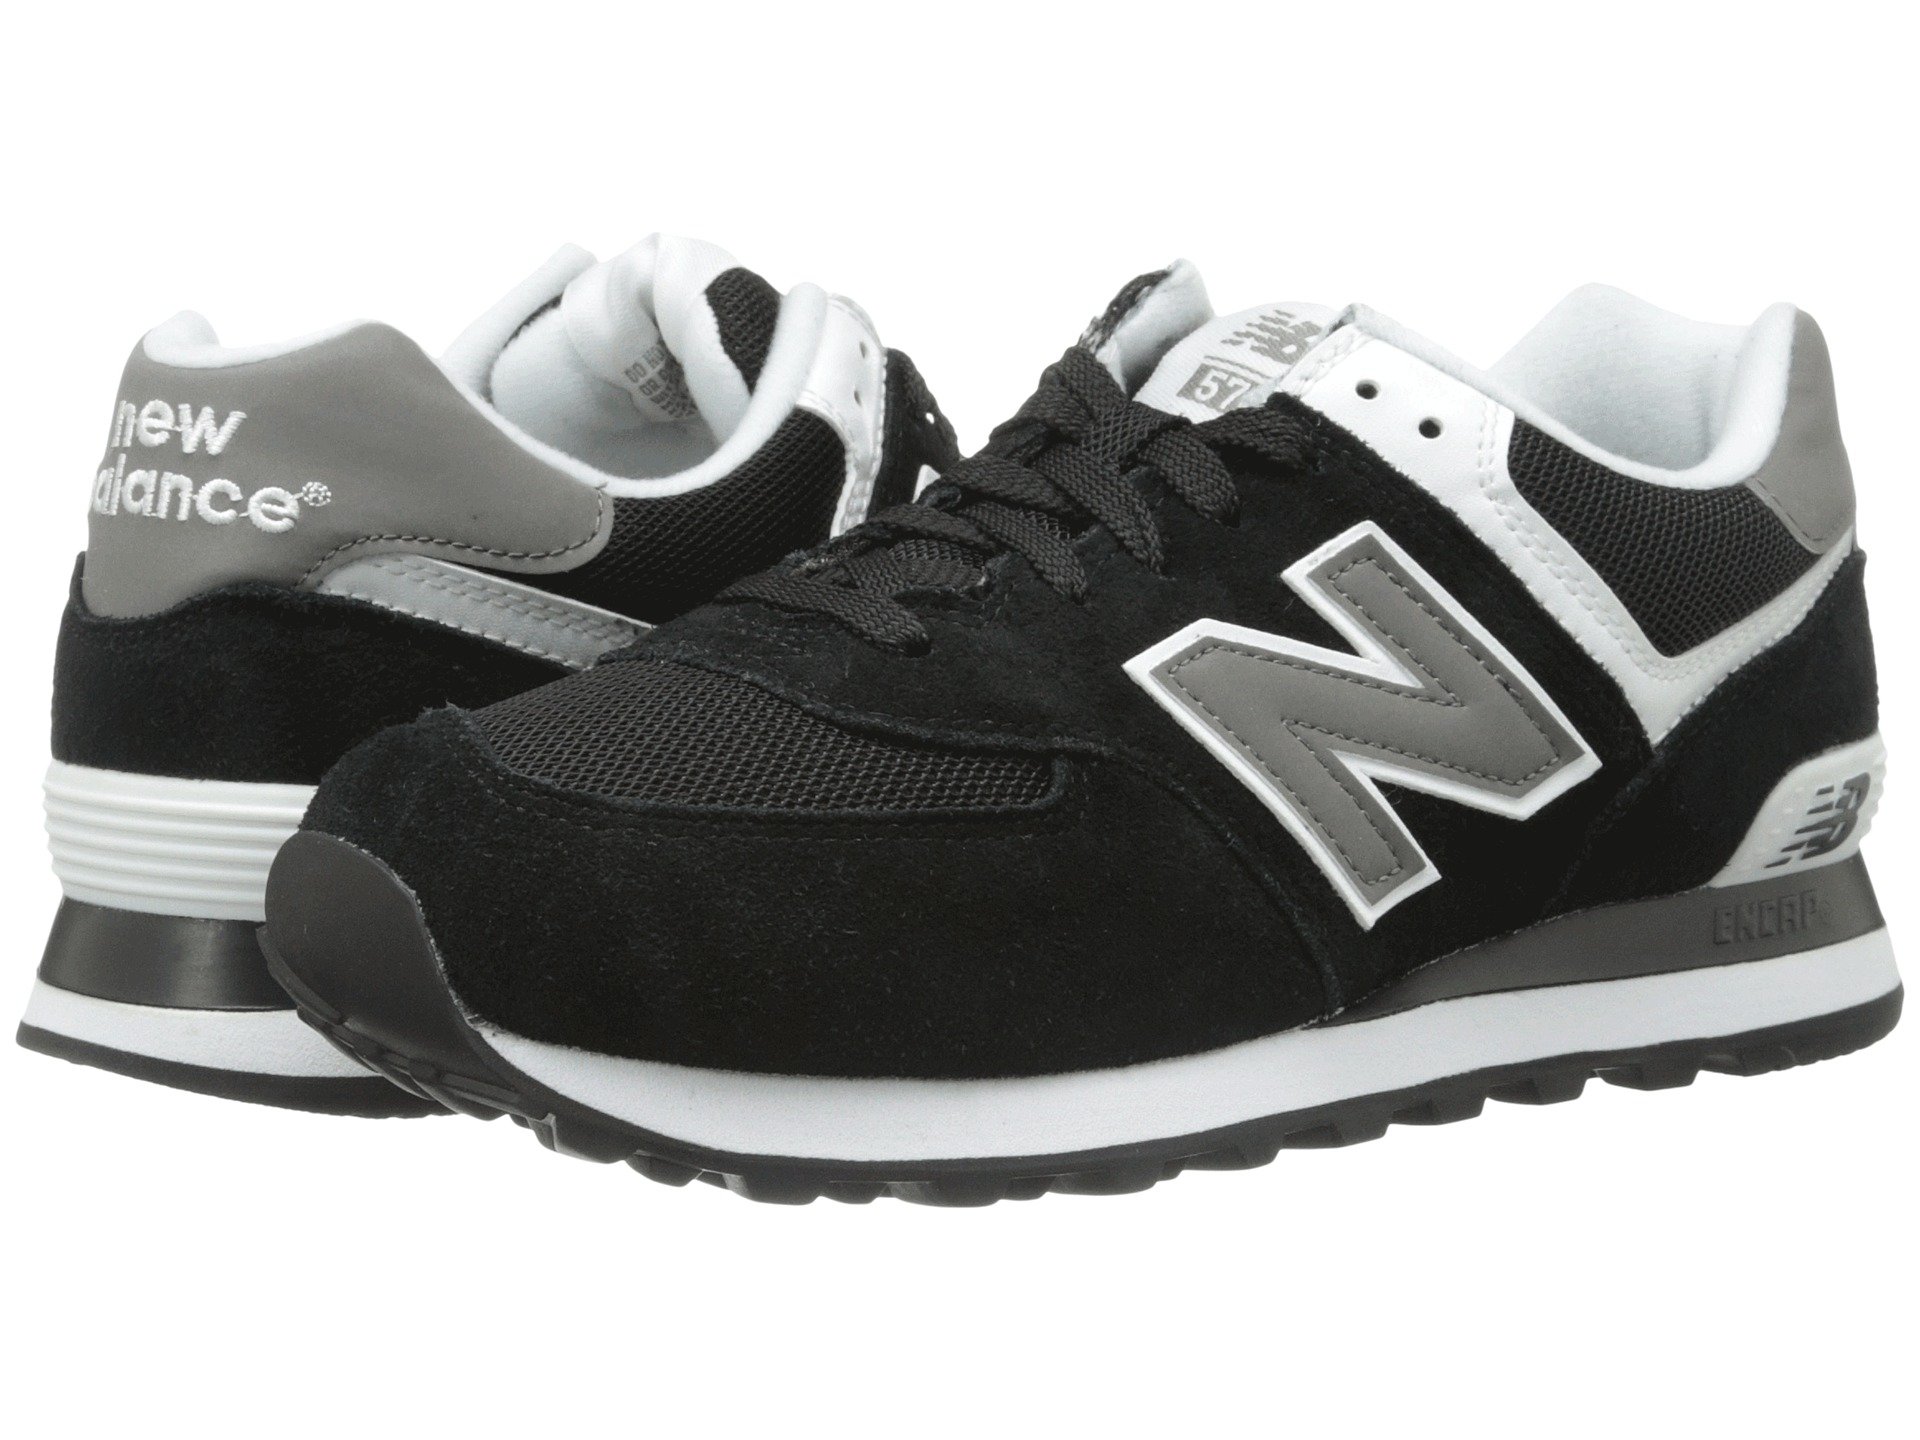 New Balance Classics M574 Black/Grey/White - Zappos.com Free Shipping BOTH Ways